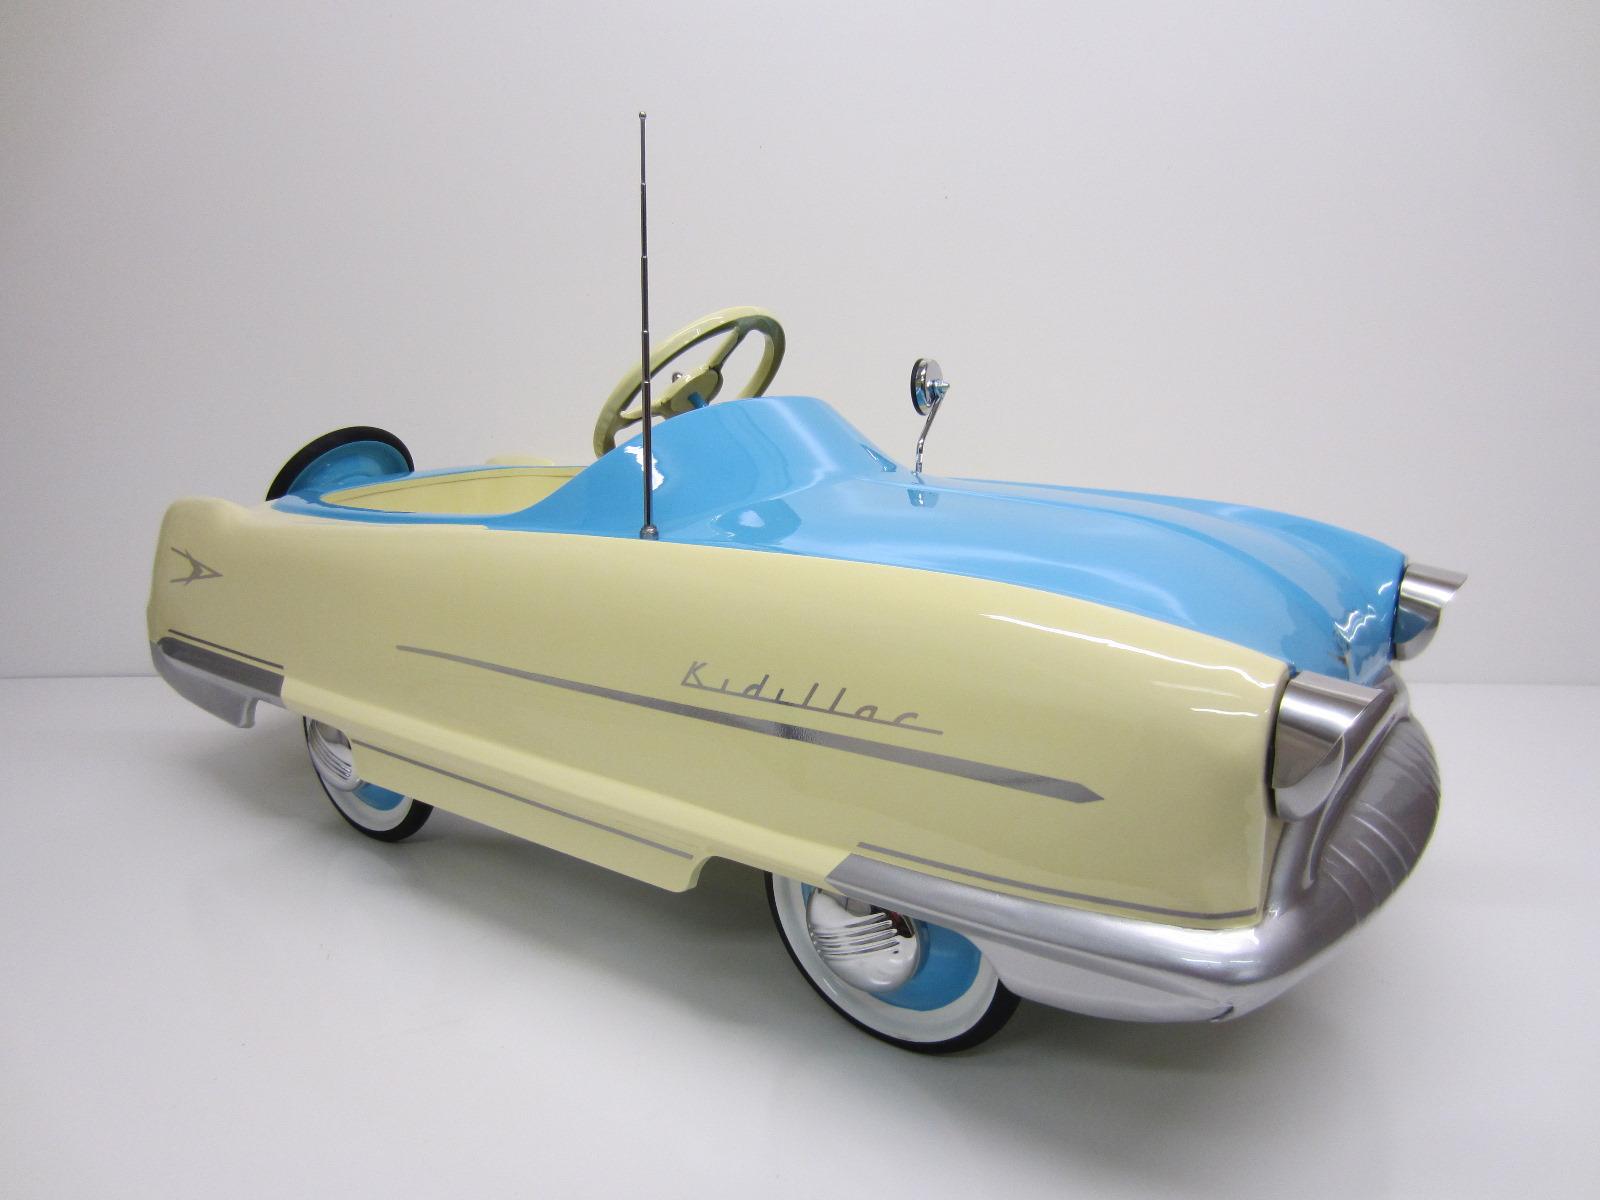 Vintage Pedal Cars C N Reproductions Inc | Upcomingcarshq.com